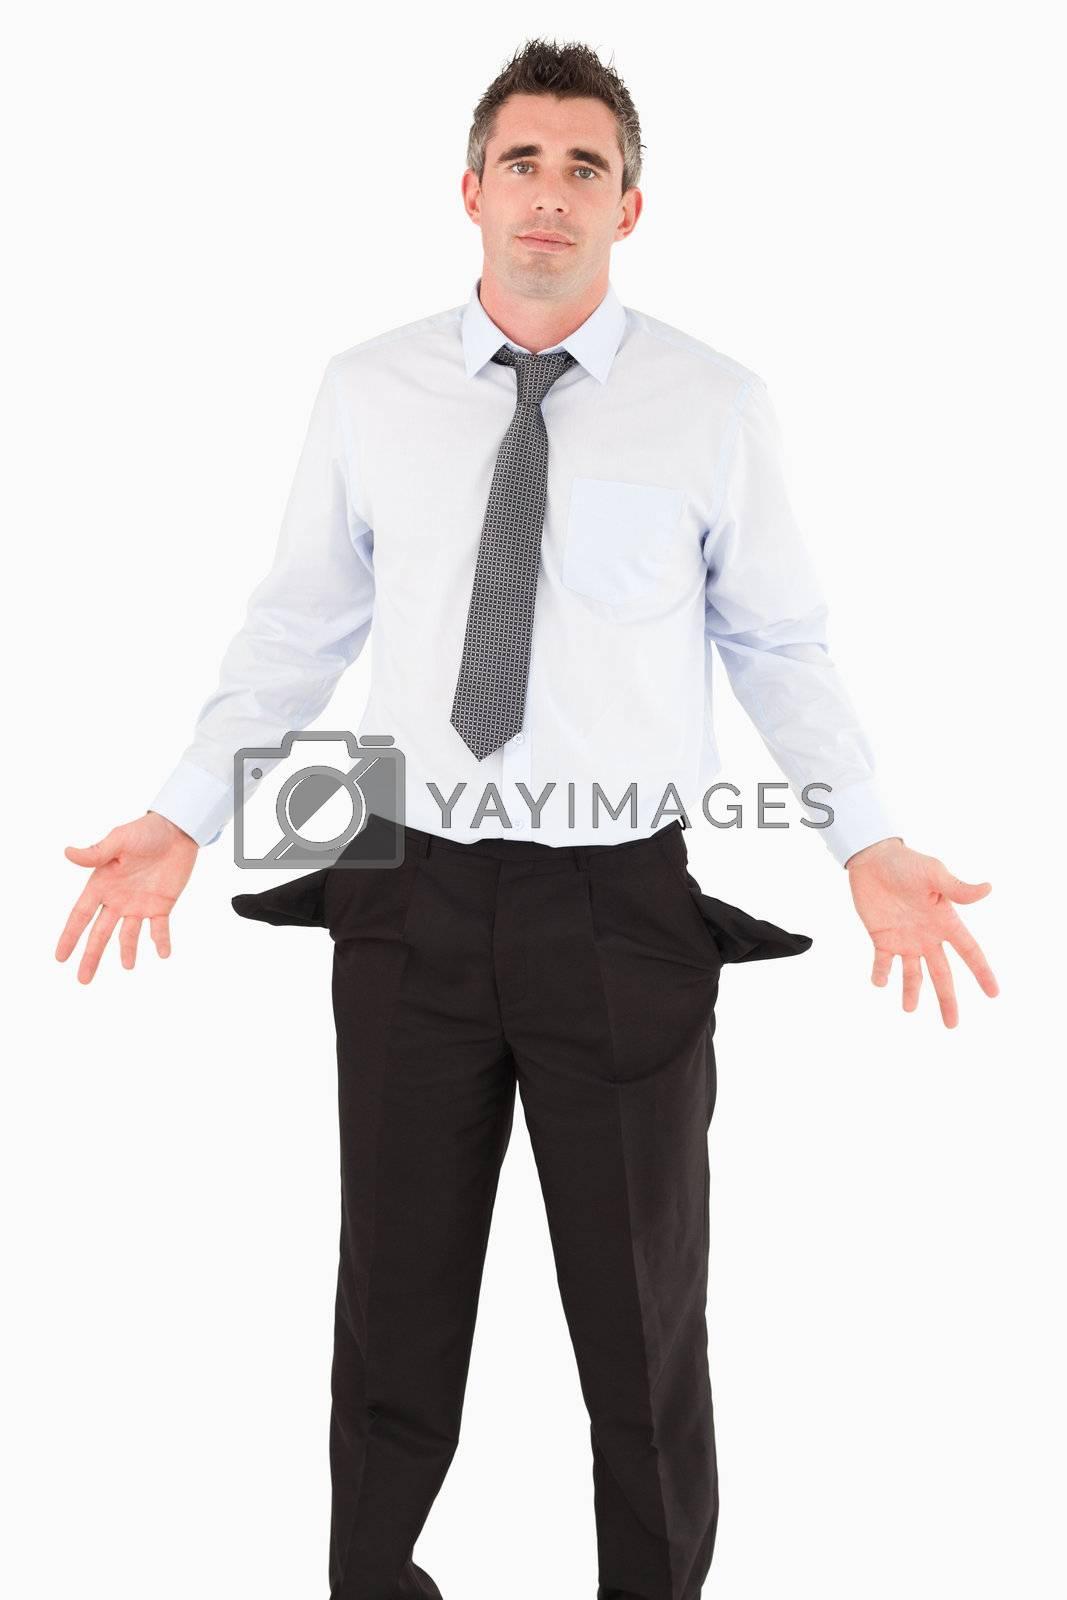 Portrait of a ruined businessman by Wavebreakmedia